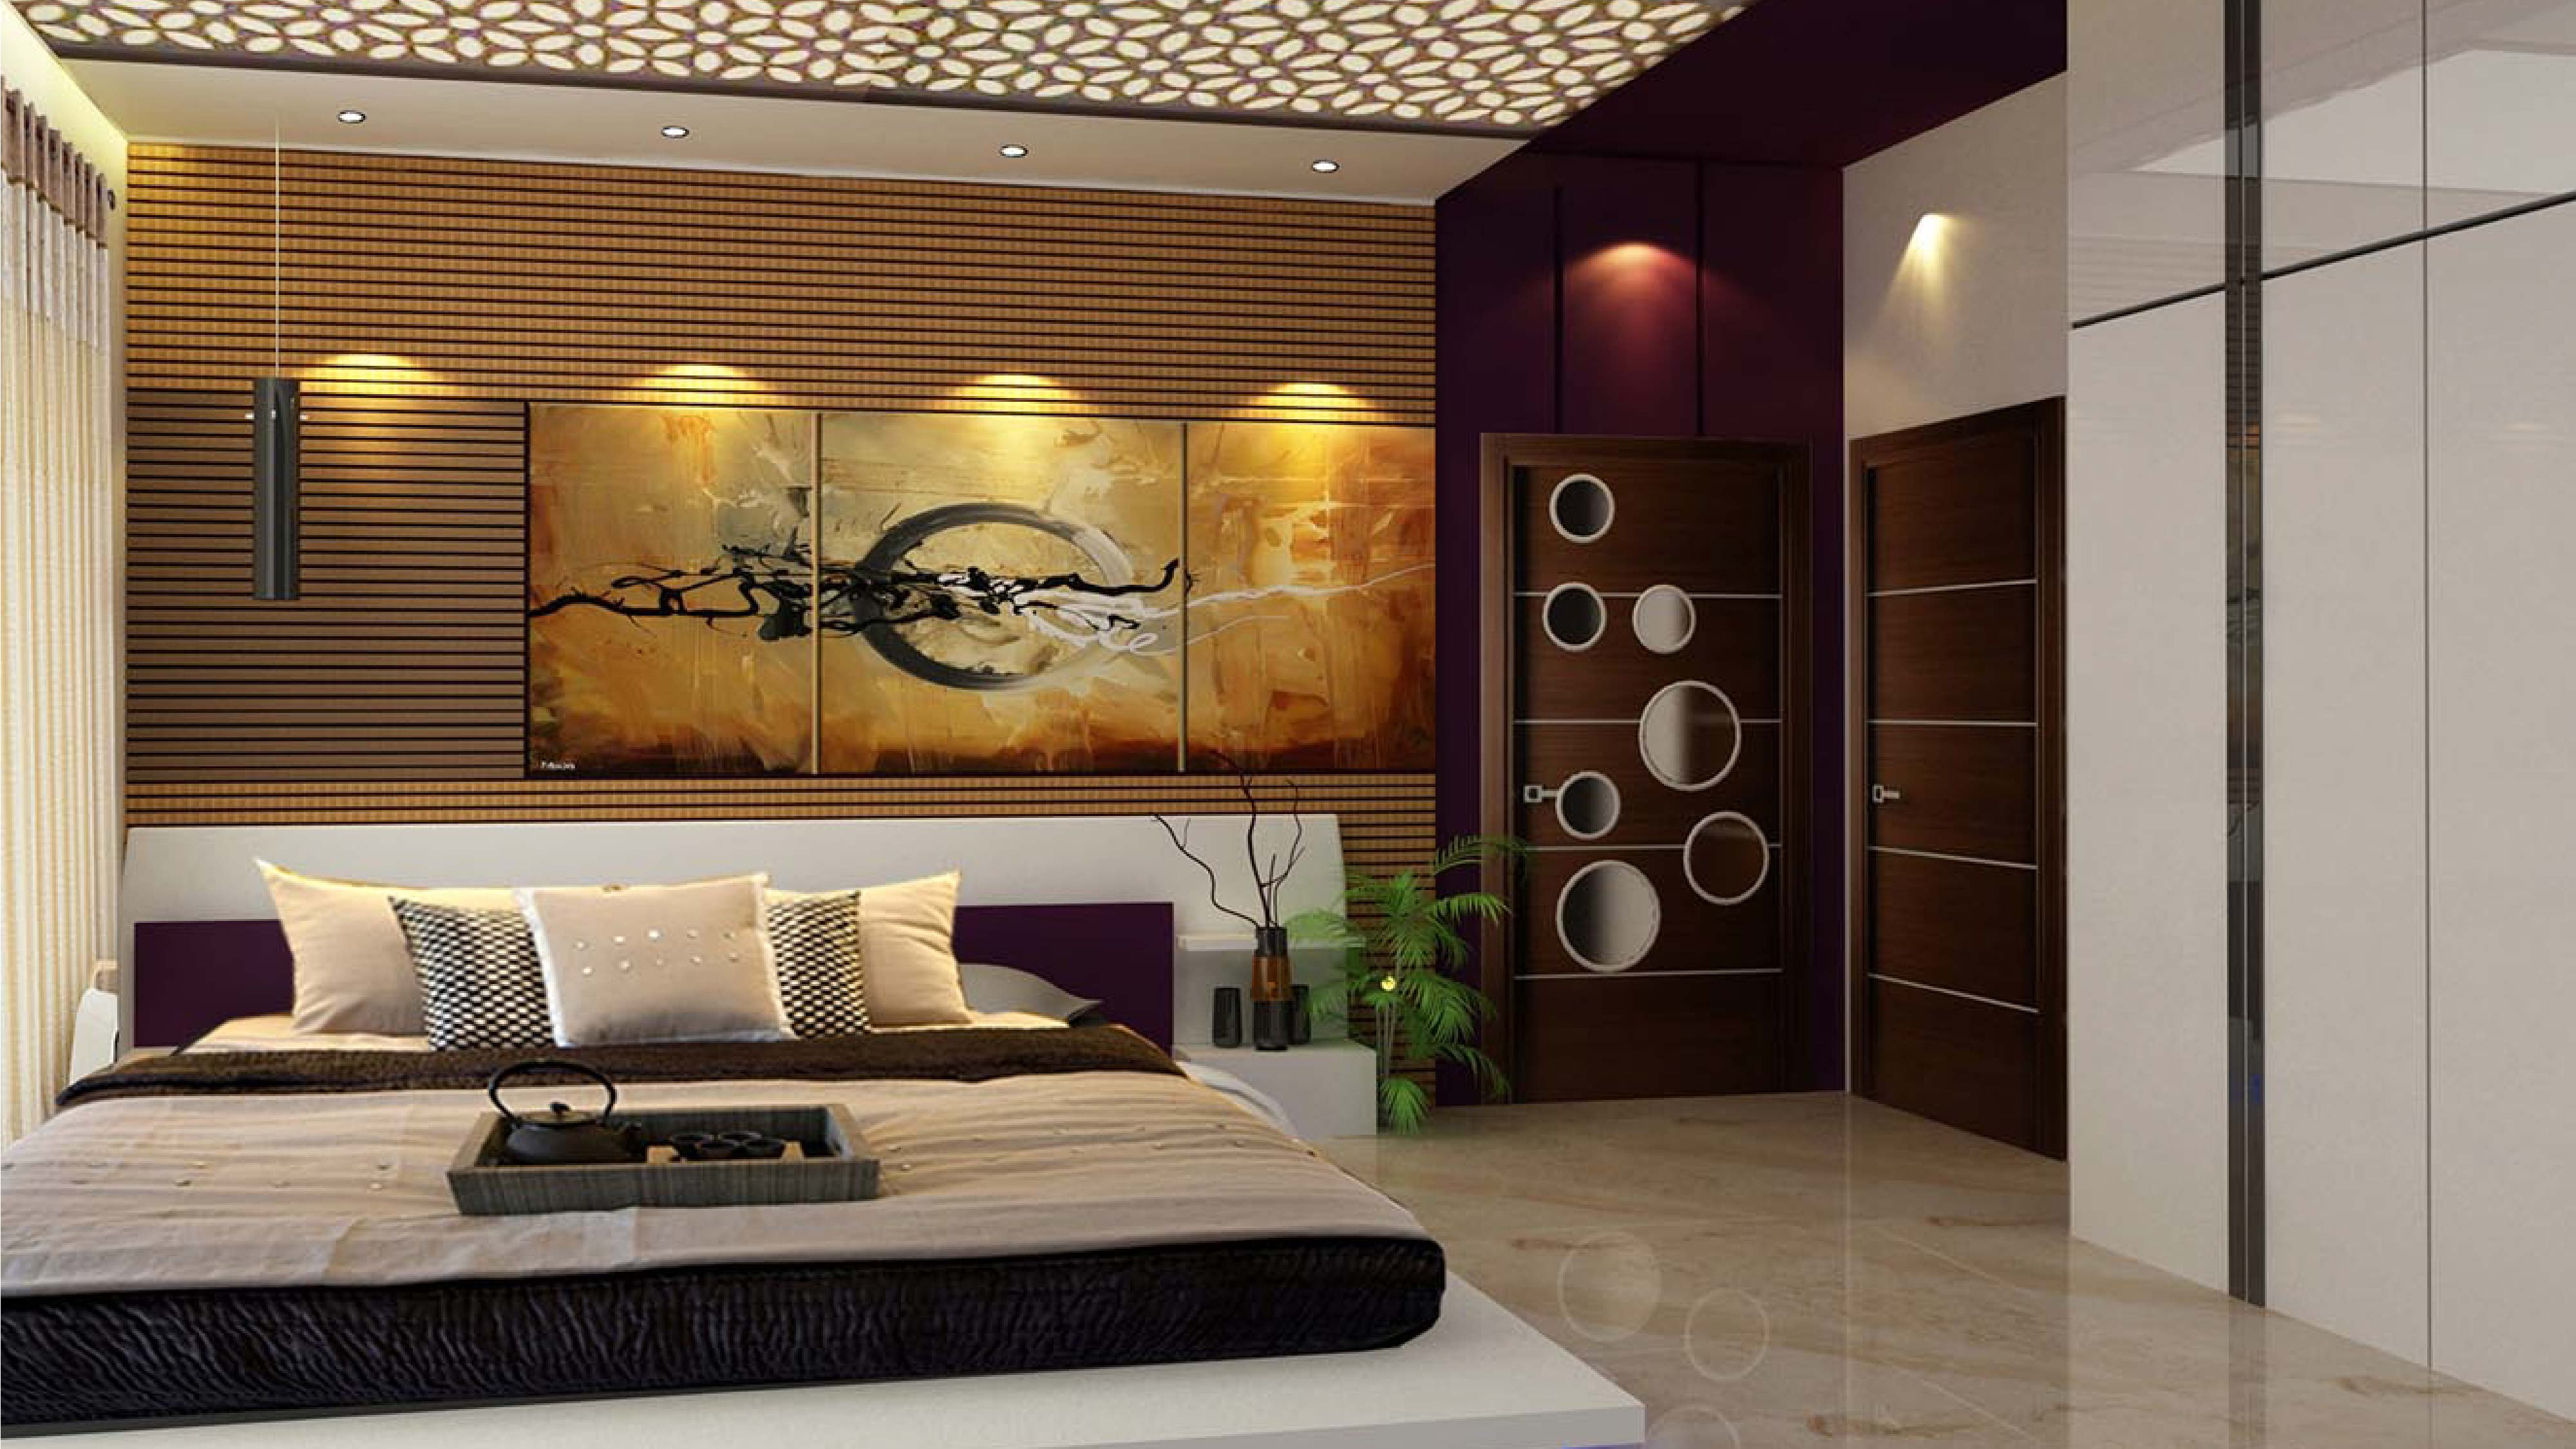 Residence interior design by FORM innovations ltd